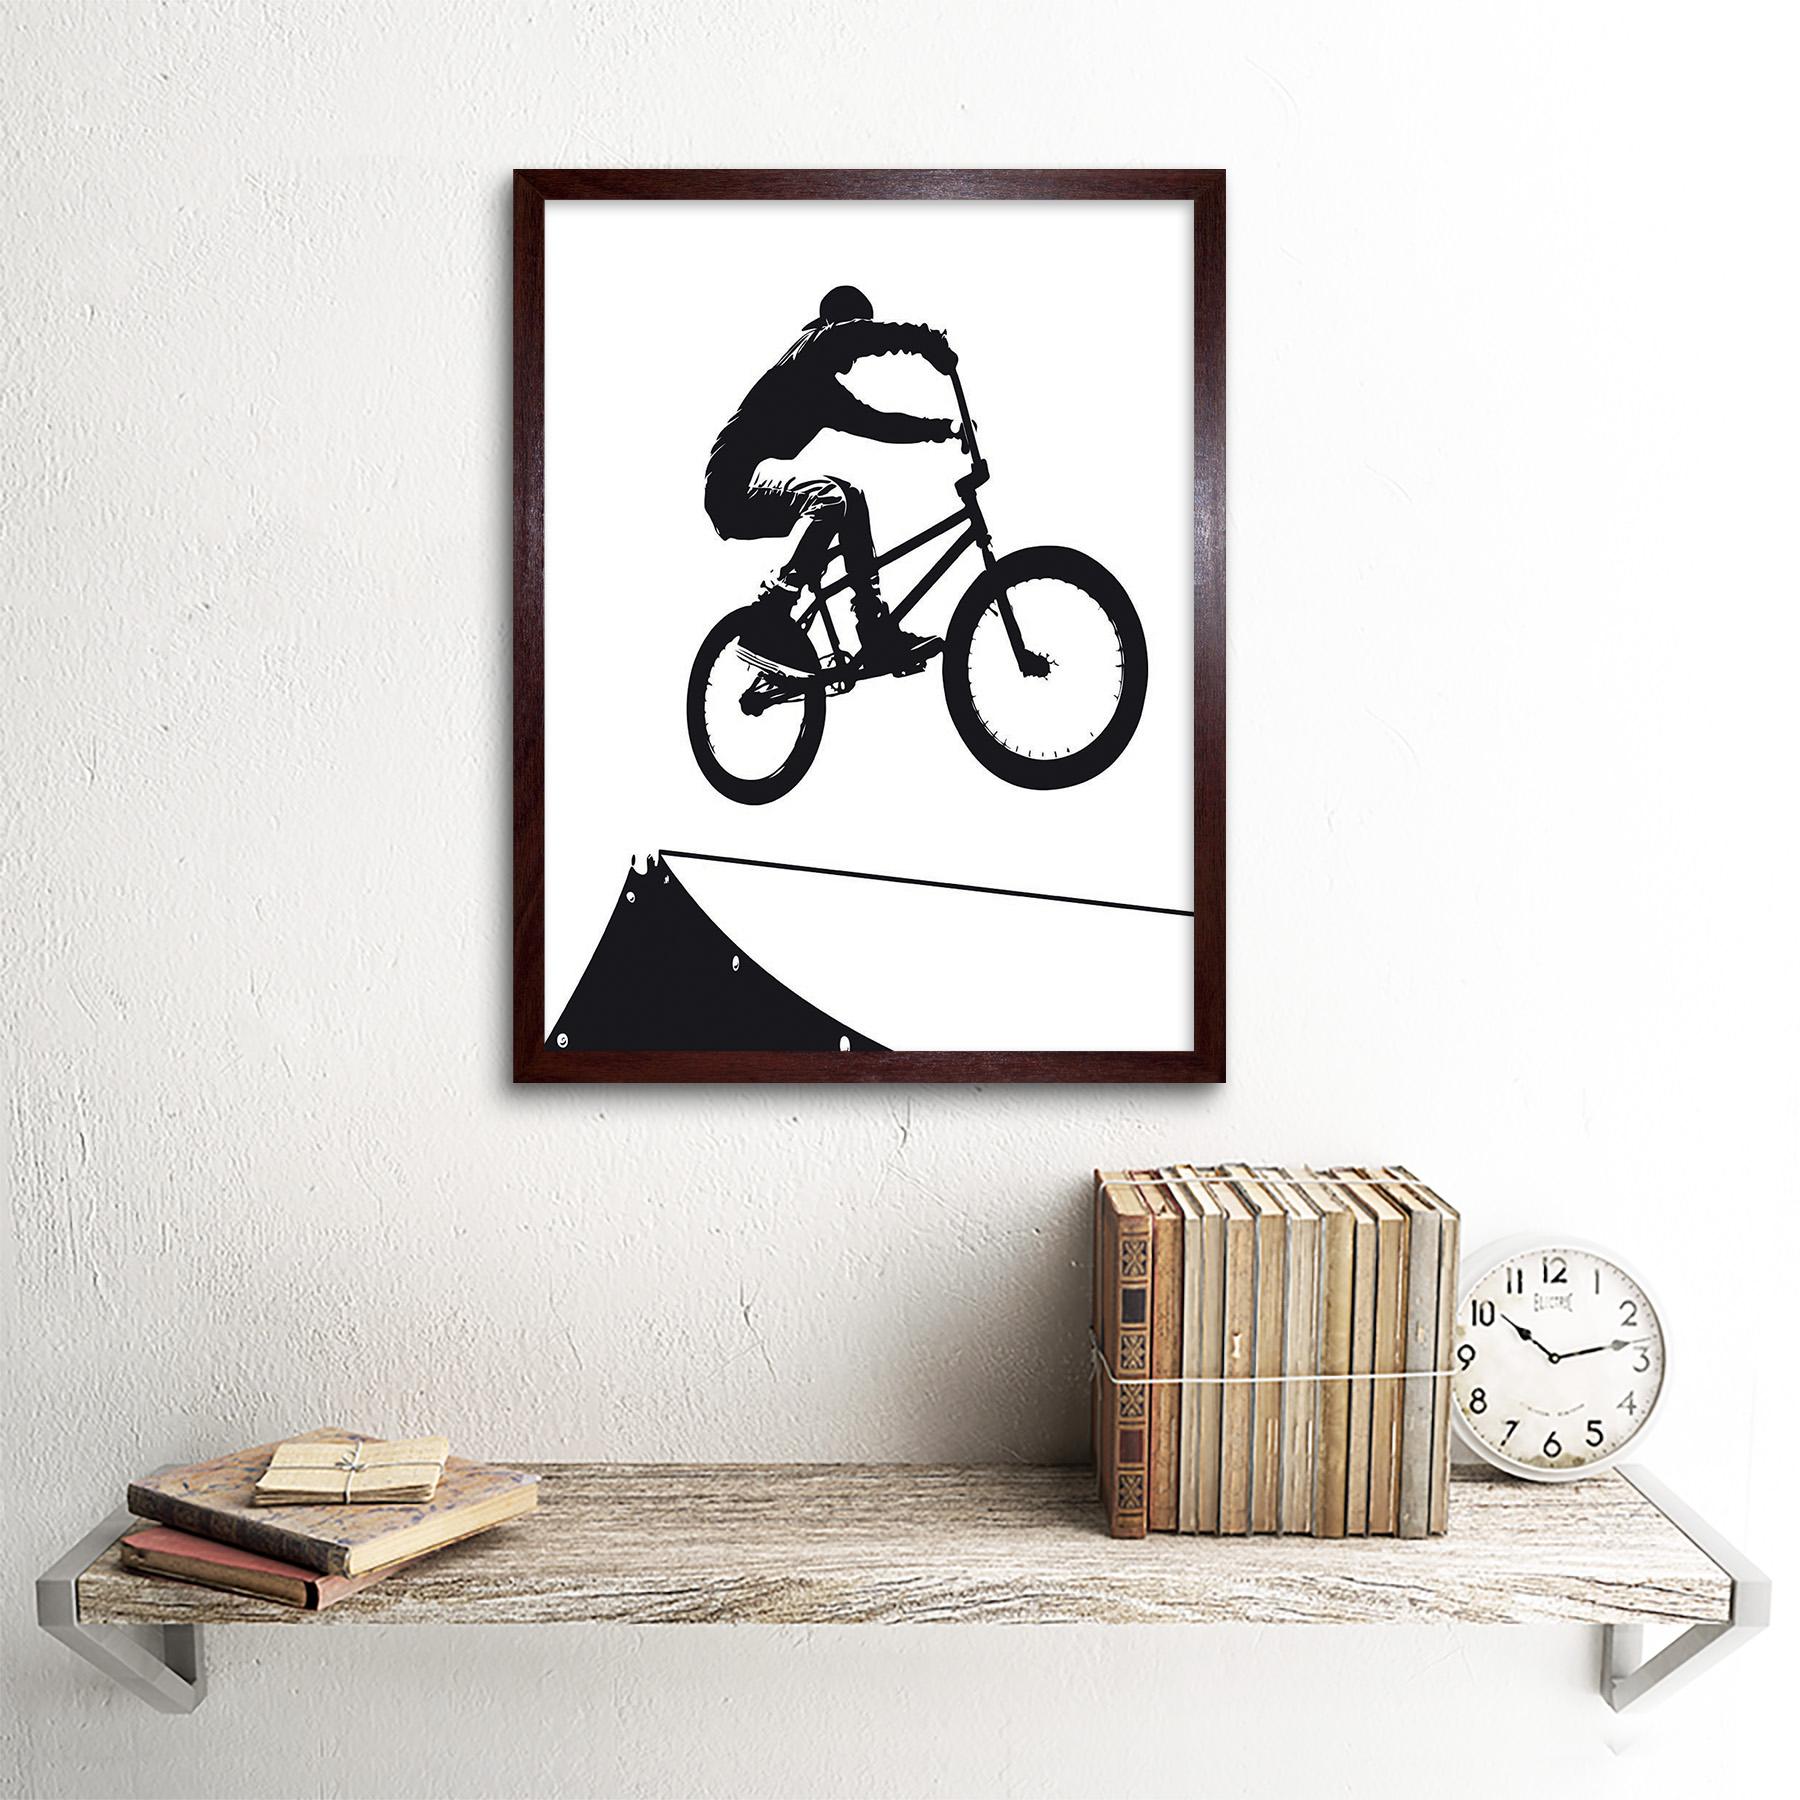 Indexbild 8 - Painting Sport Bmx Bike Bicycle Jump Air Ramp Black White 12X16 Framed Art Print